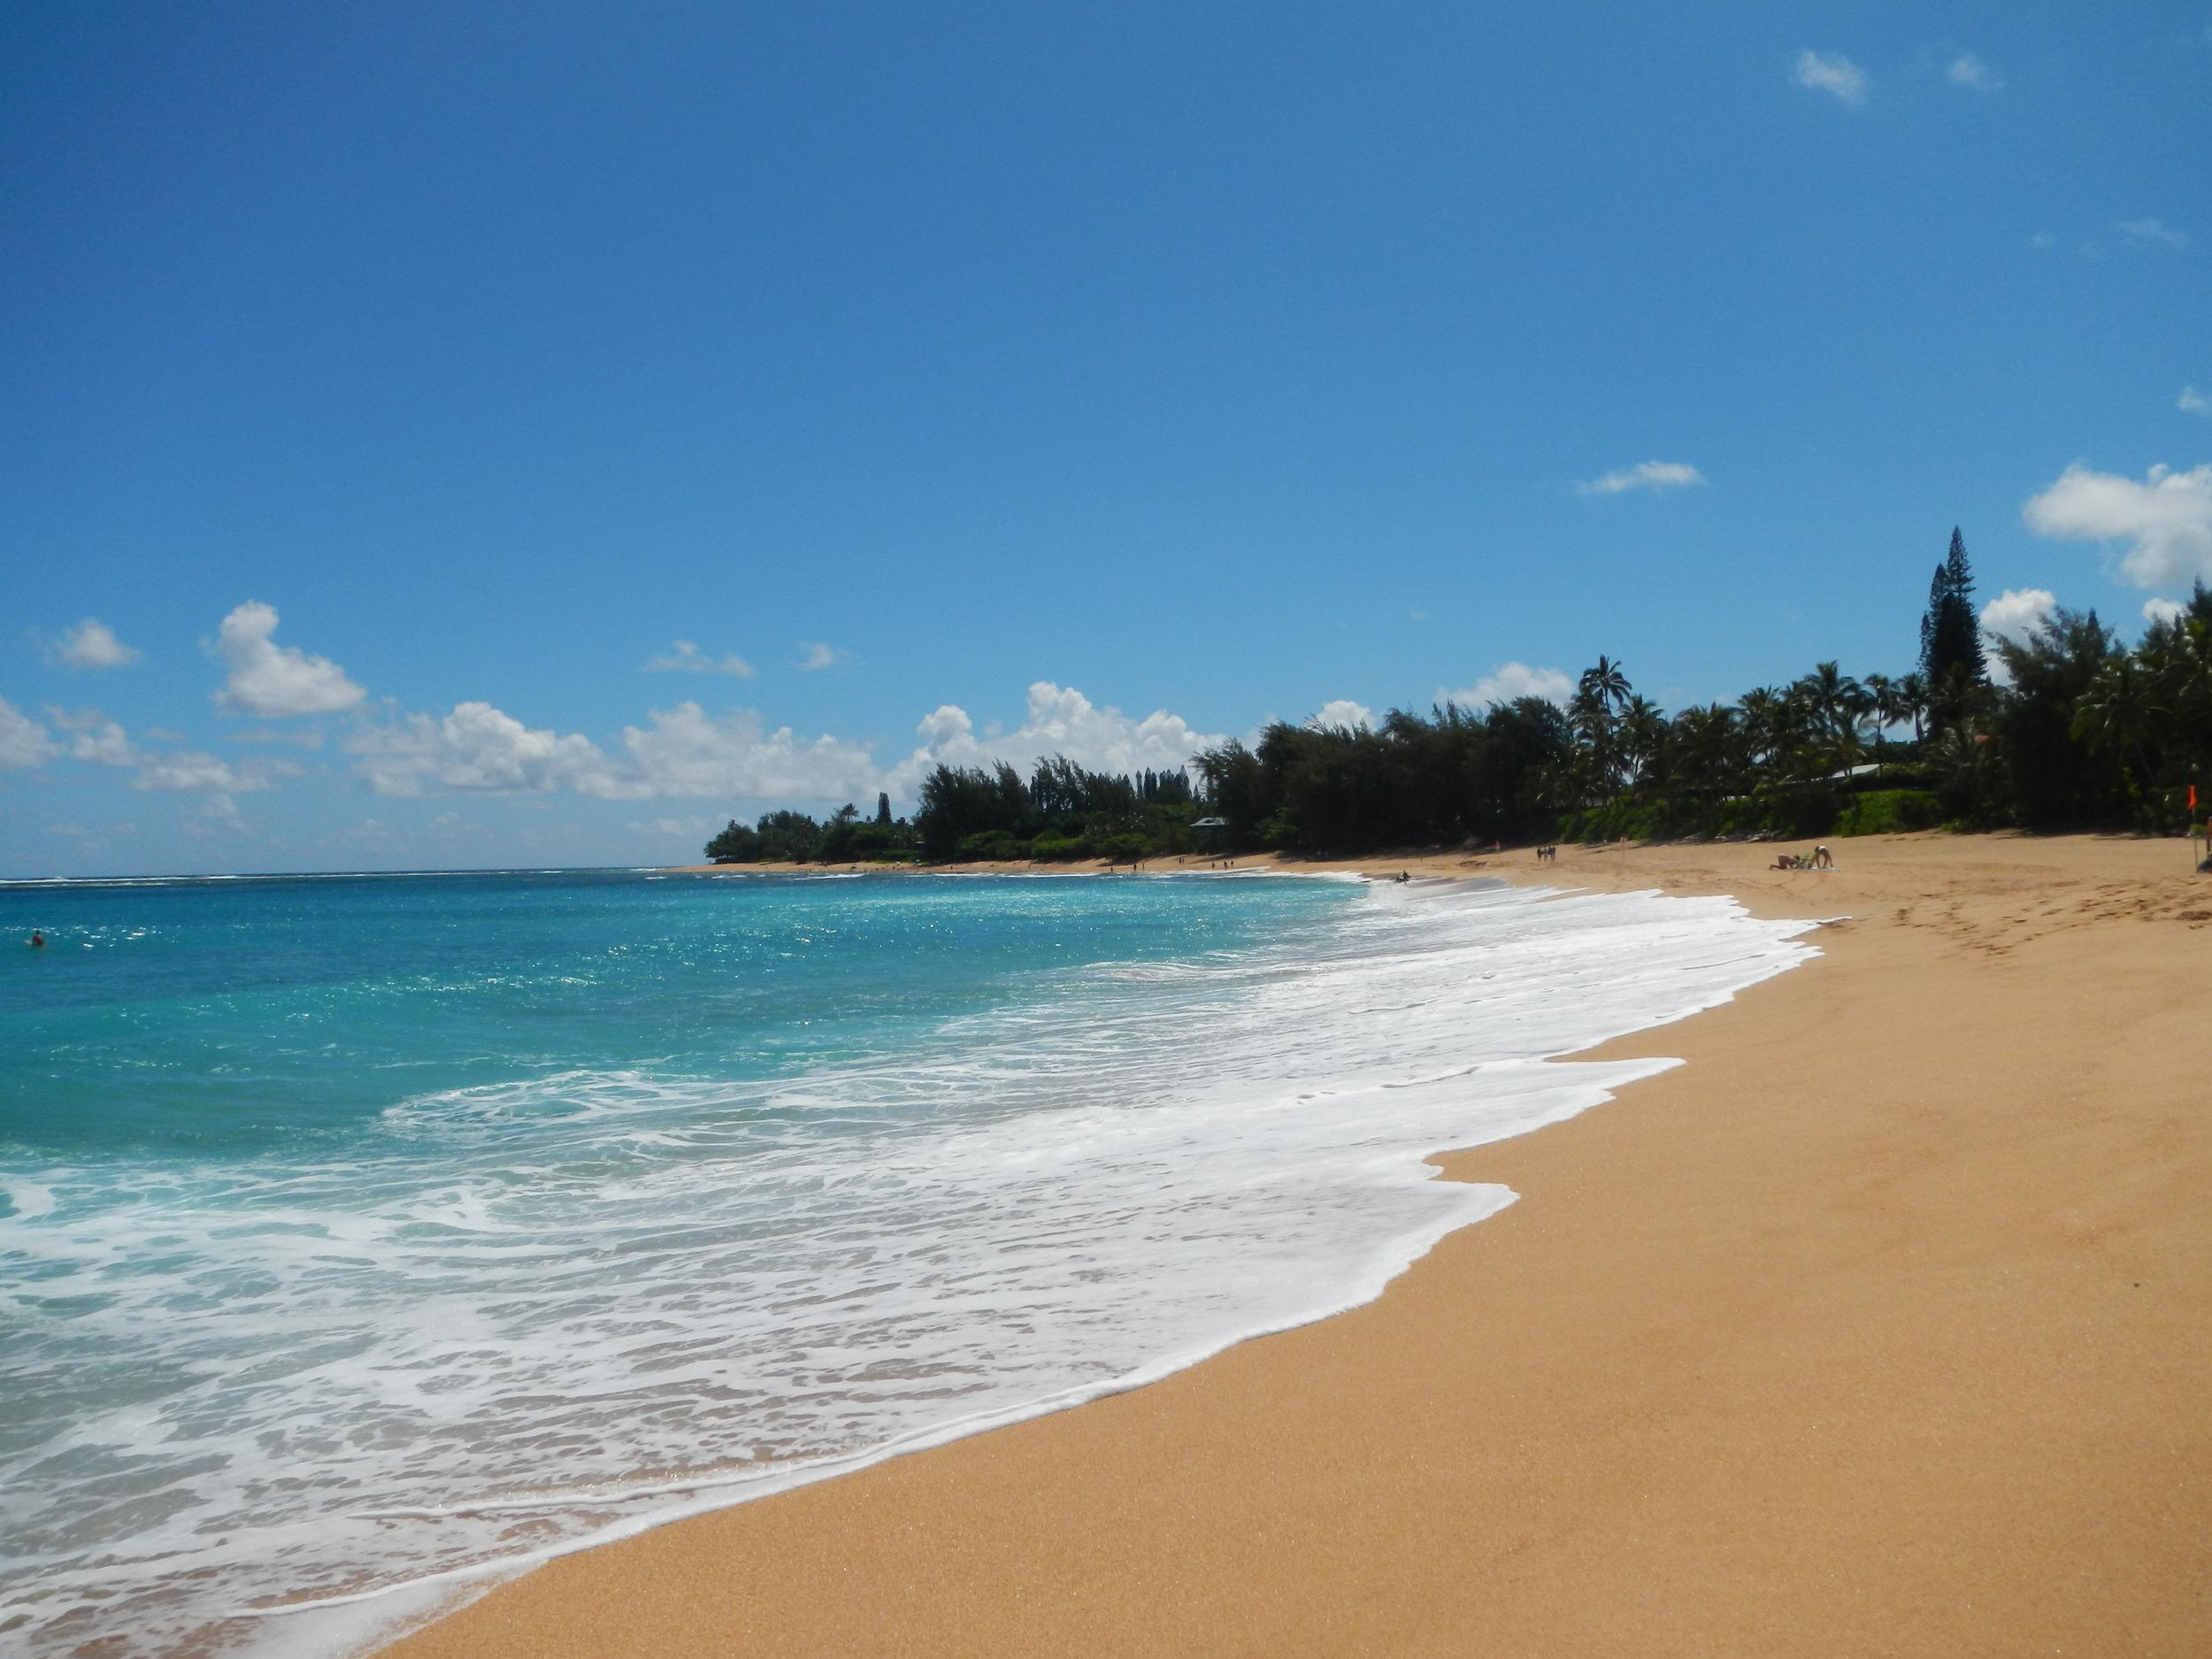 North Kauai Beach